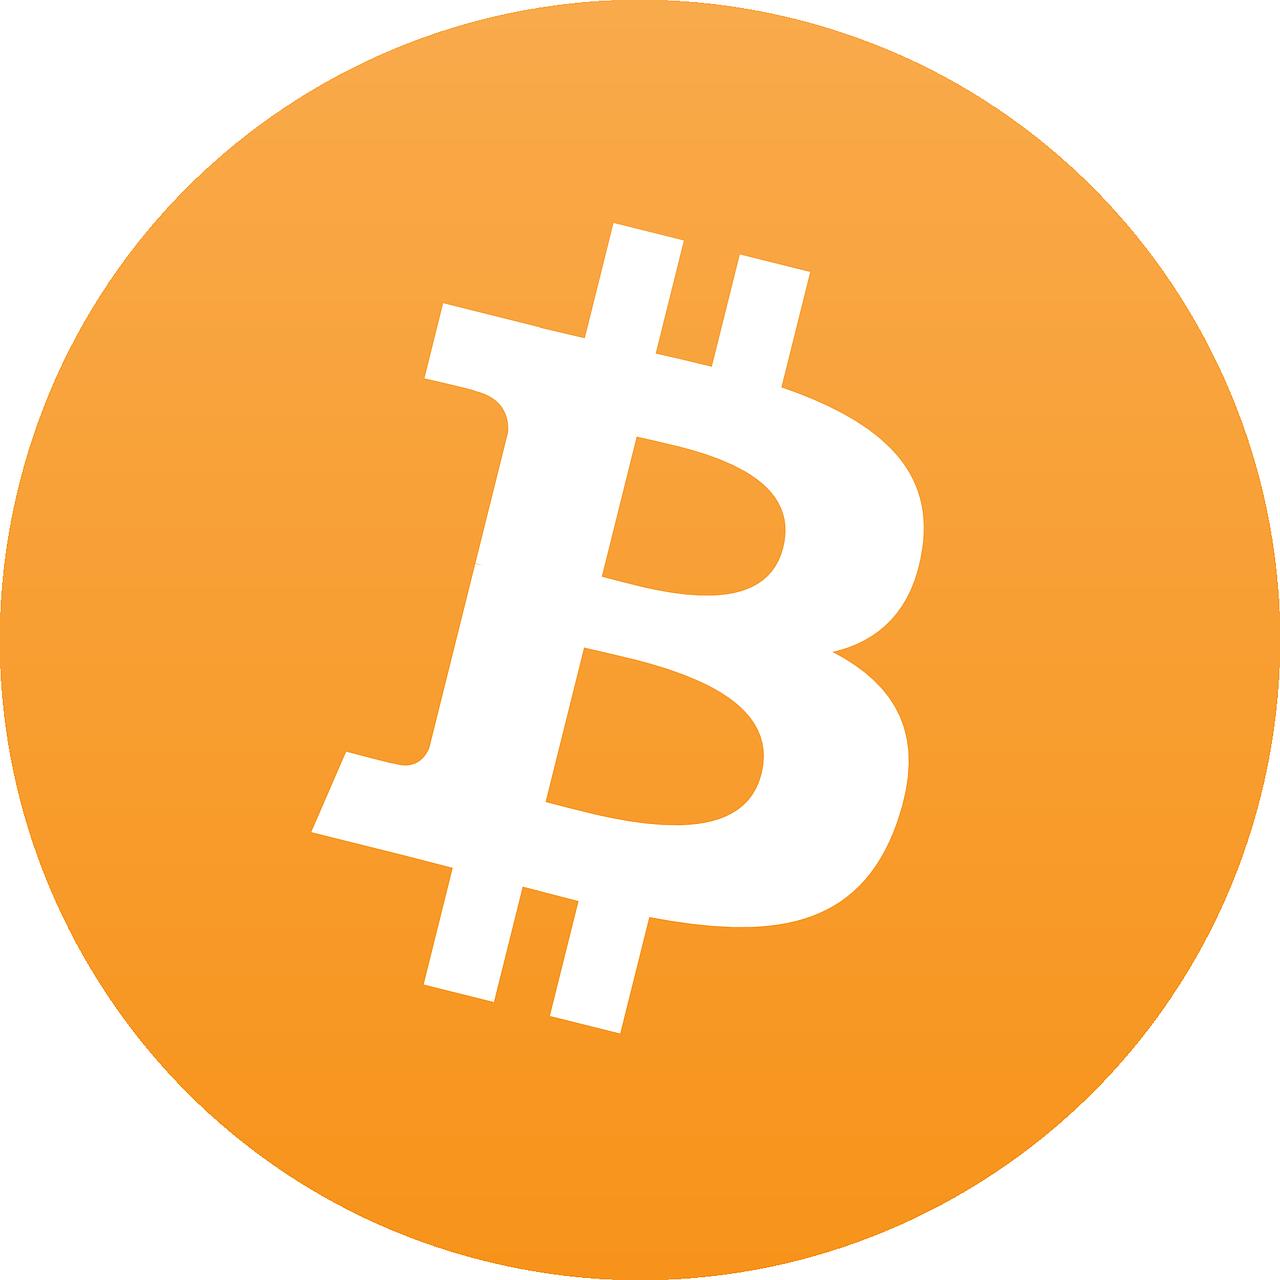 Coin clipart english.  minimal css frameworks